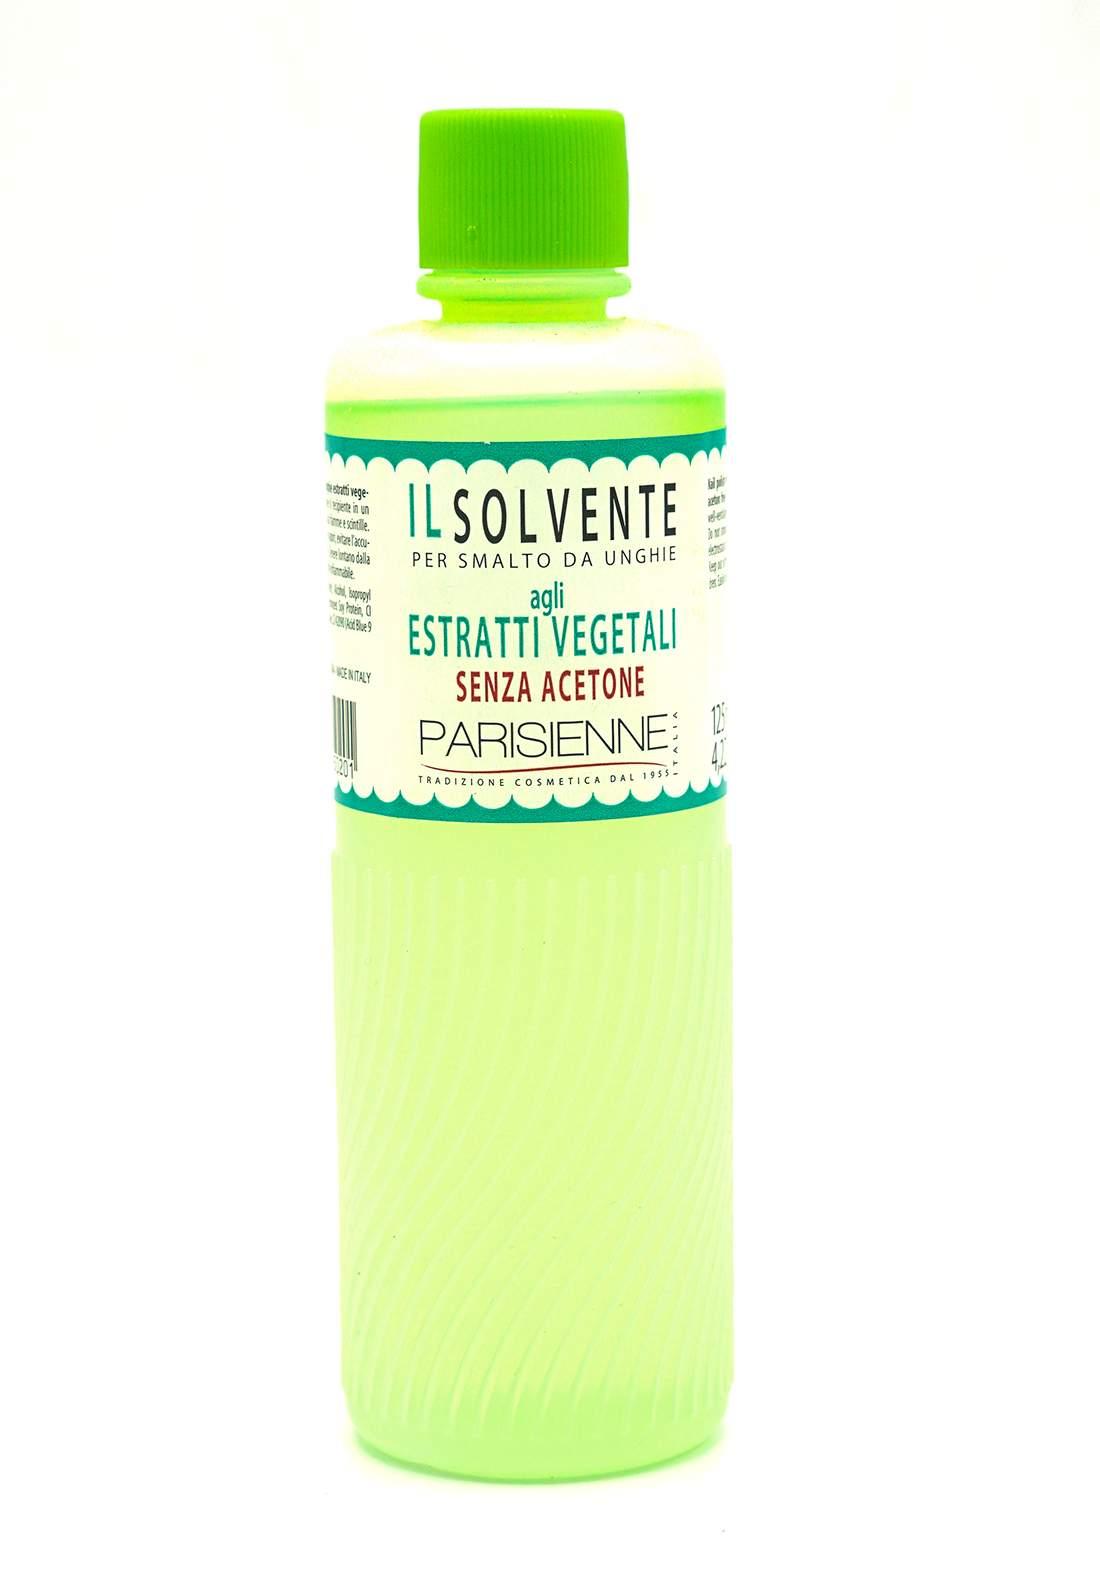 Parisienne Nail Polish Remover With Plant Extract 125ML مزيل طلاء الاظافر